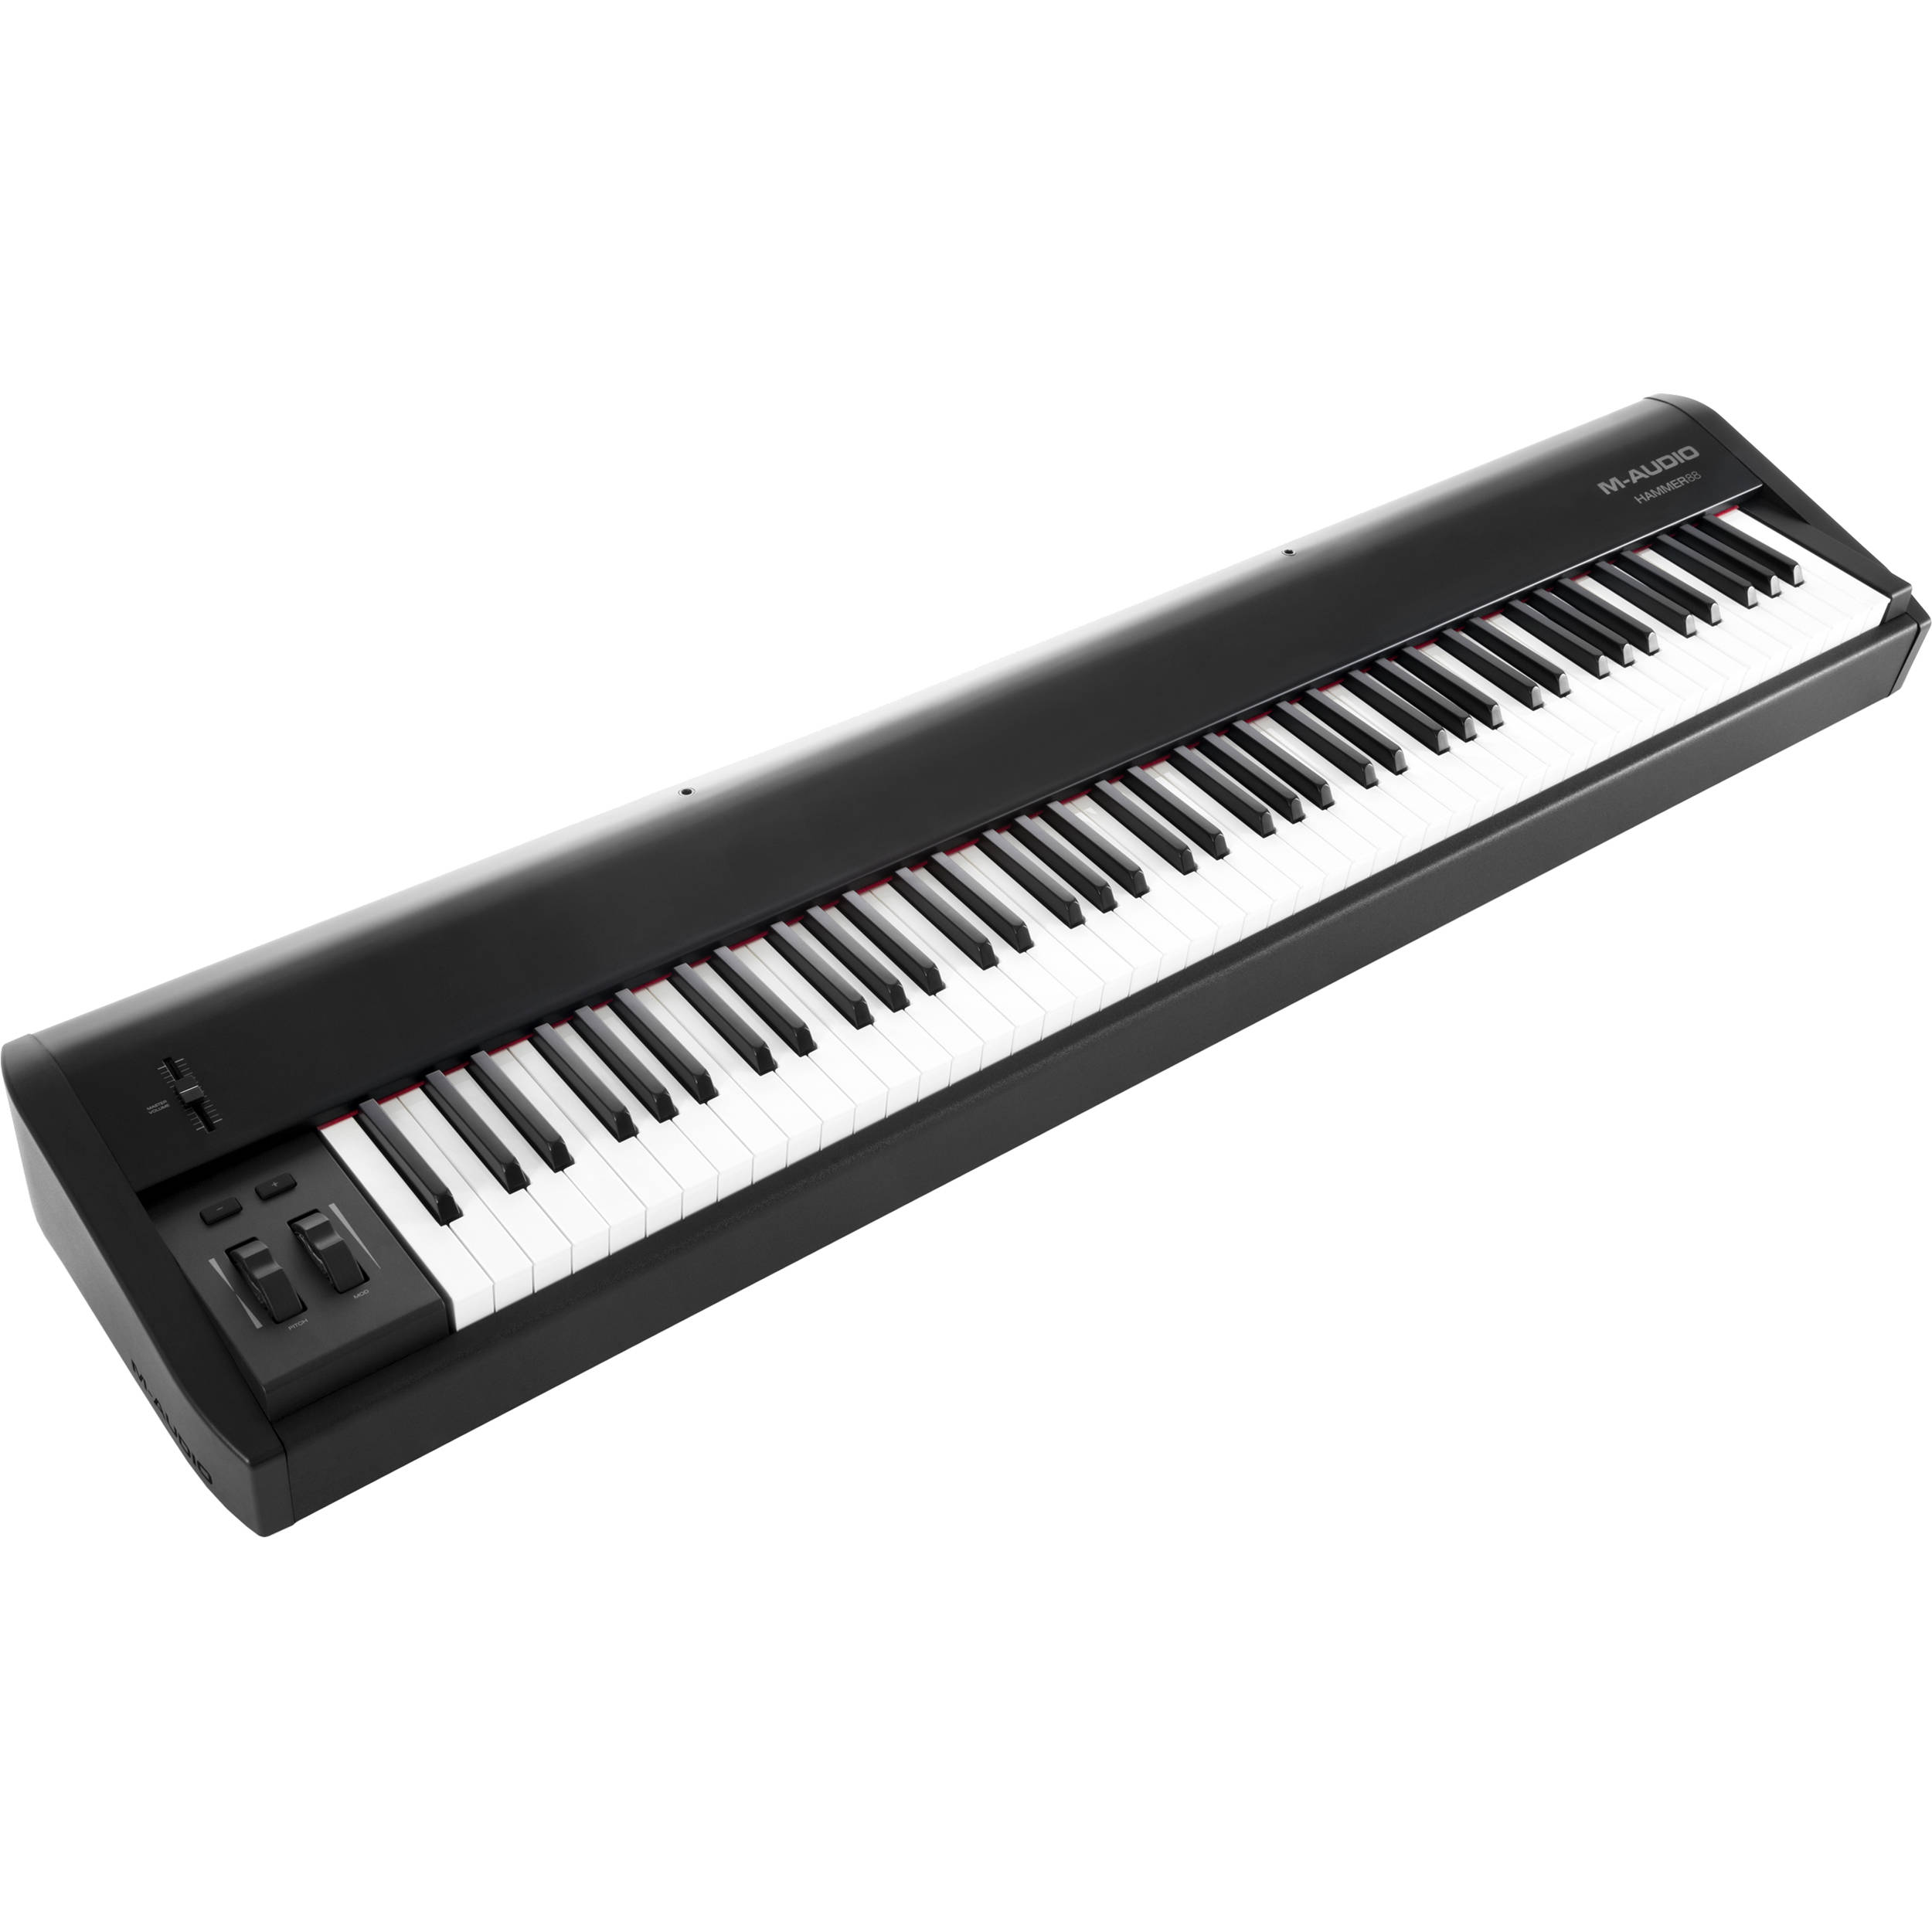 m audio hammer 88 88 key usb midi keyboard controller hammer 88. Black Bedroom Furniture Sets. Home Design Ideas